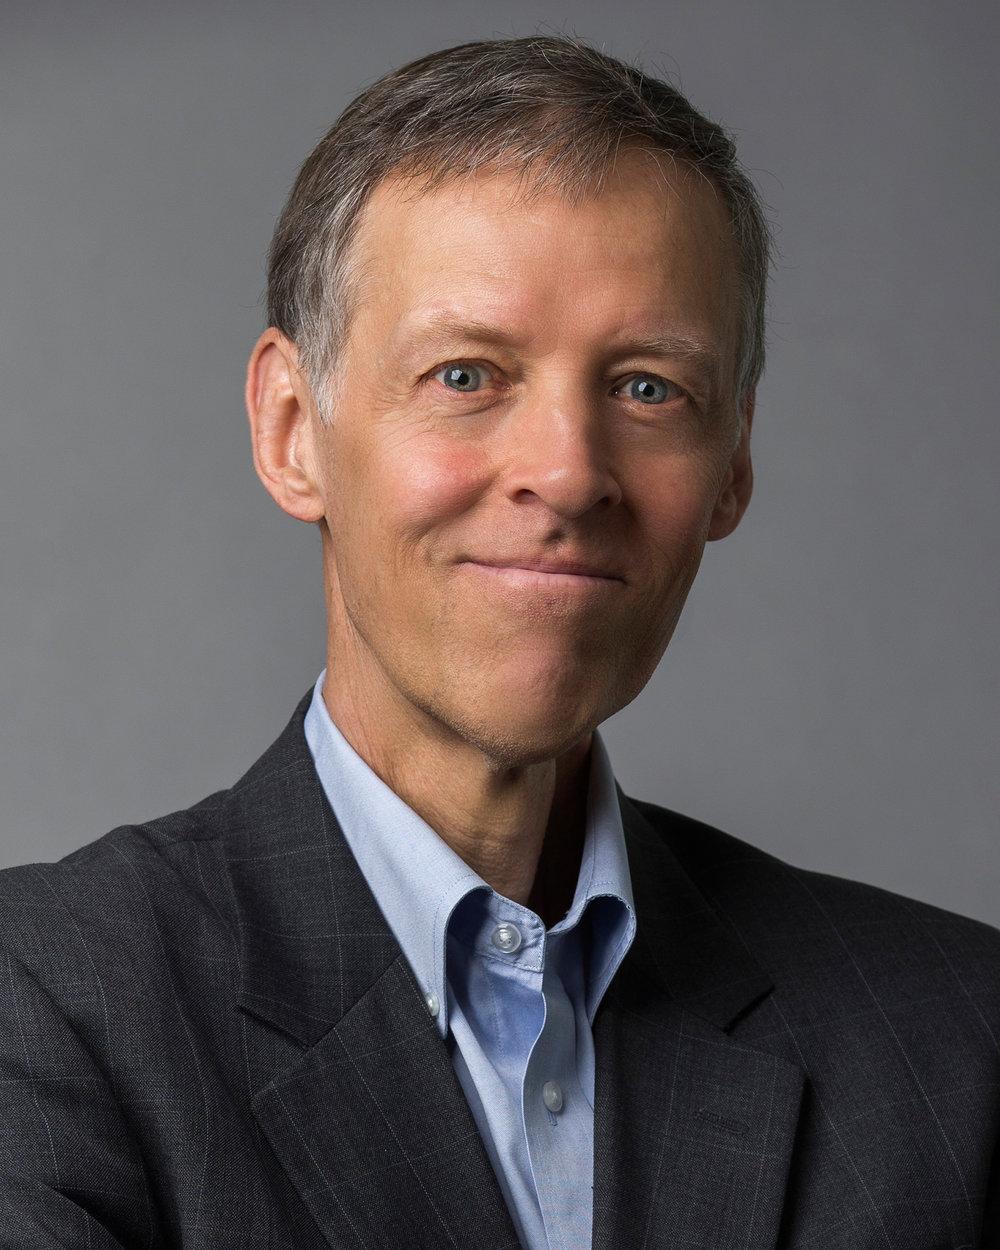 Rob Atkinson  @RobAtkinsonITIF   President, Information Technology and Innovation Foundation